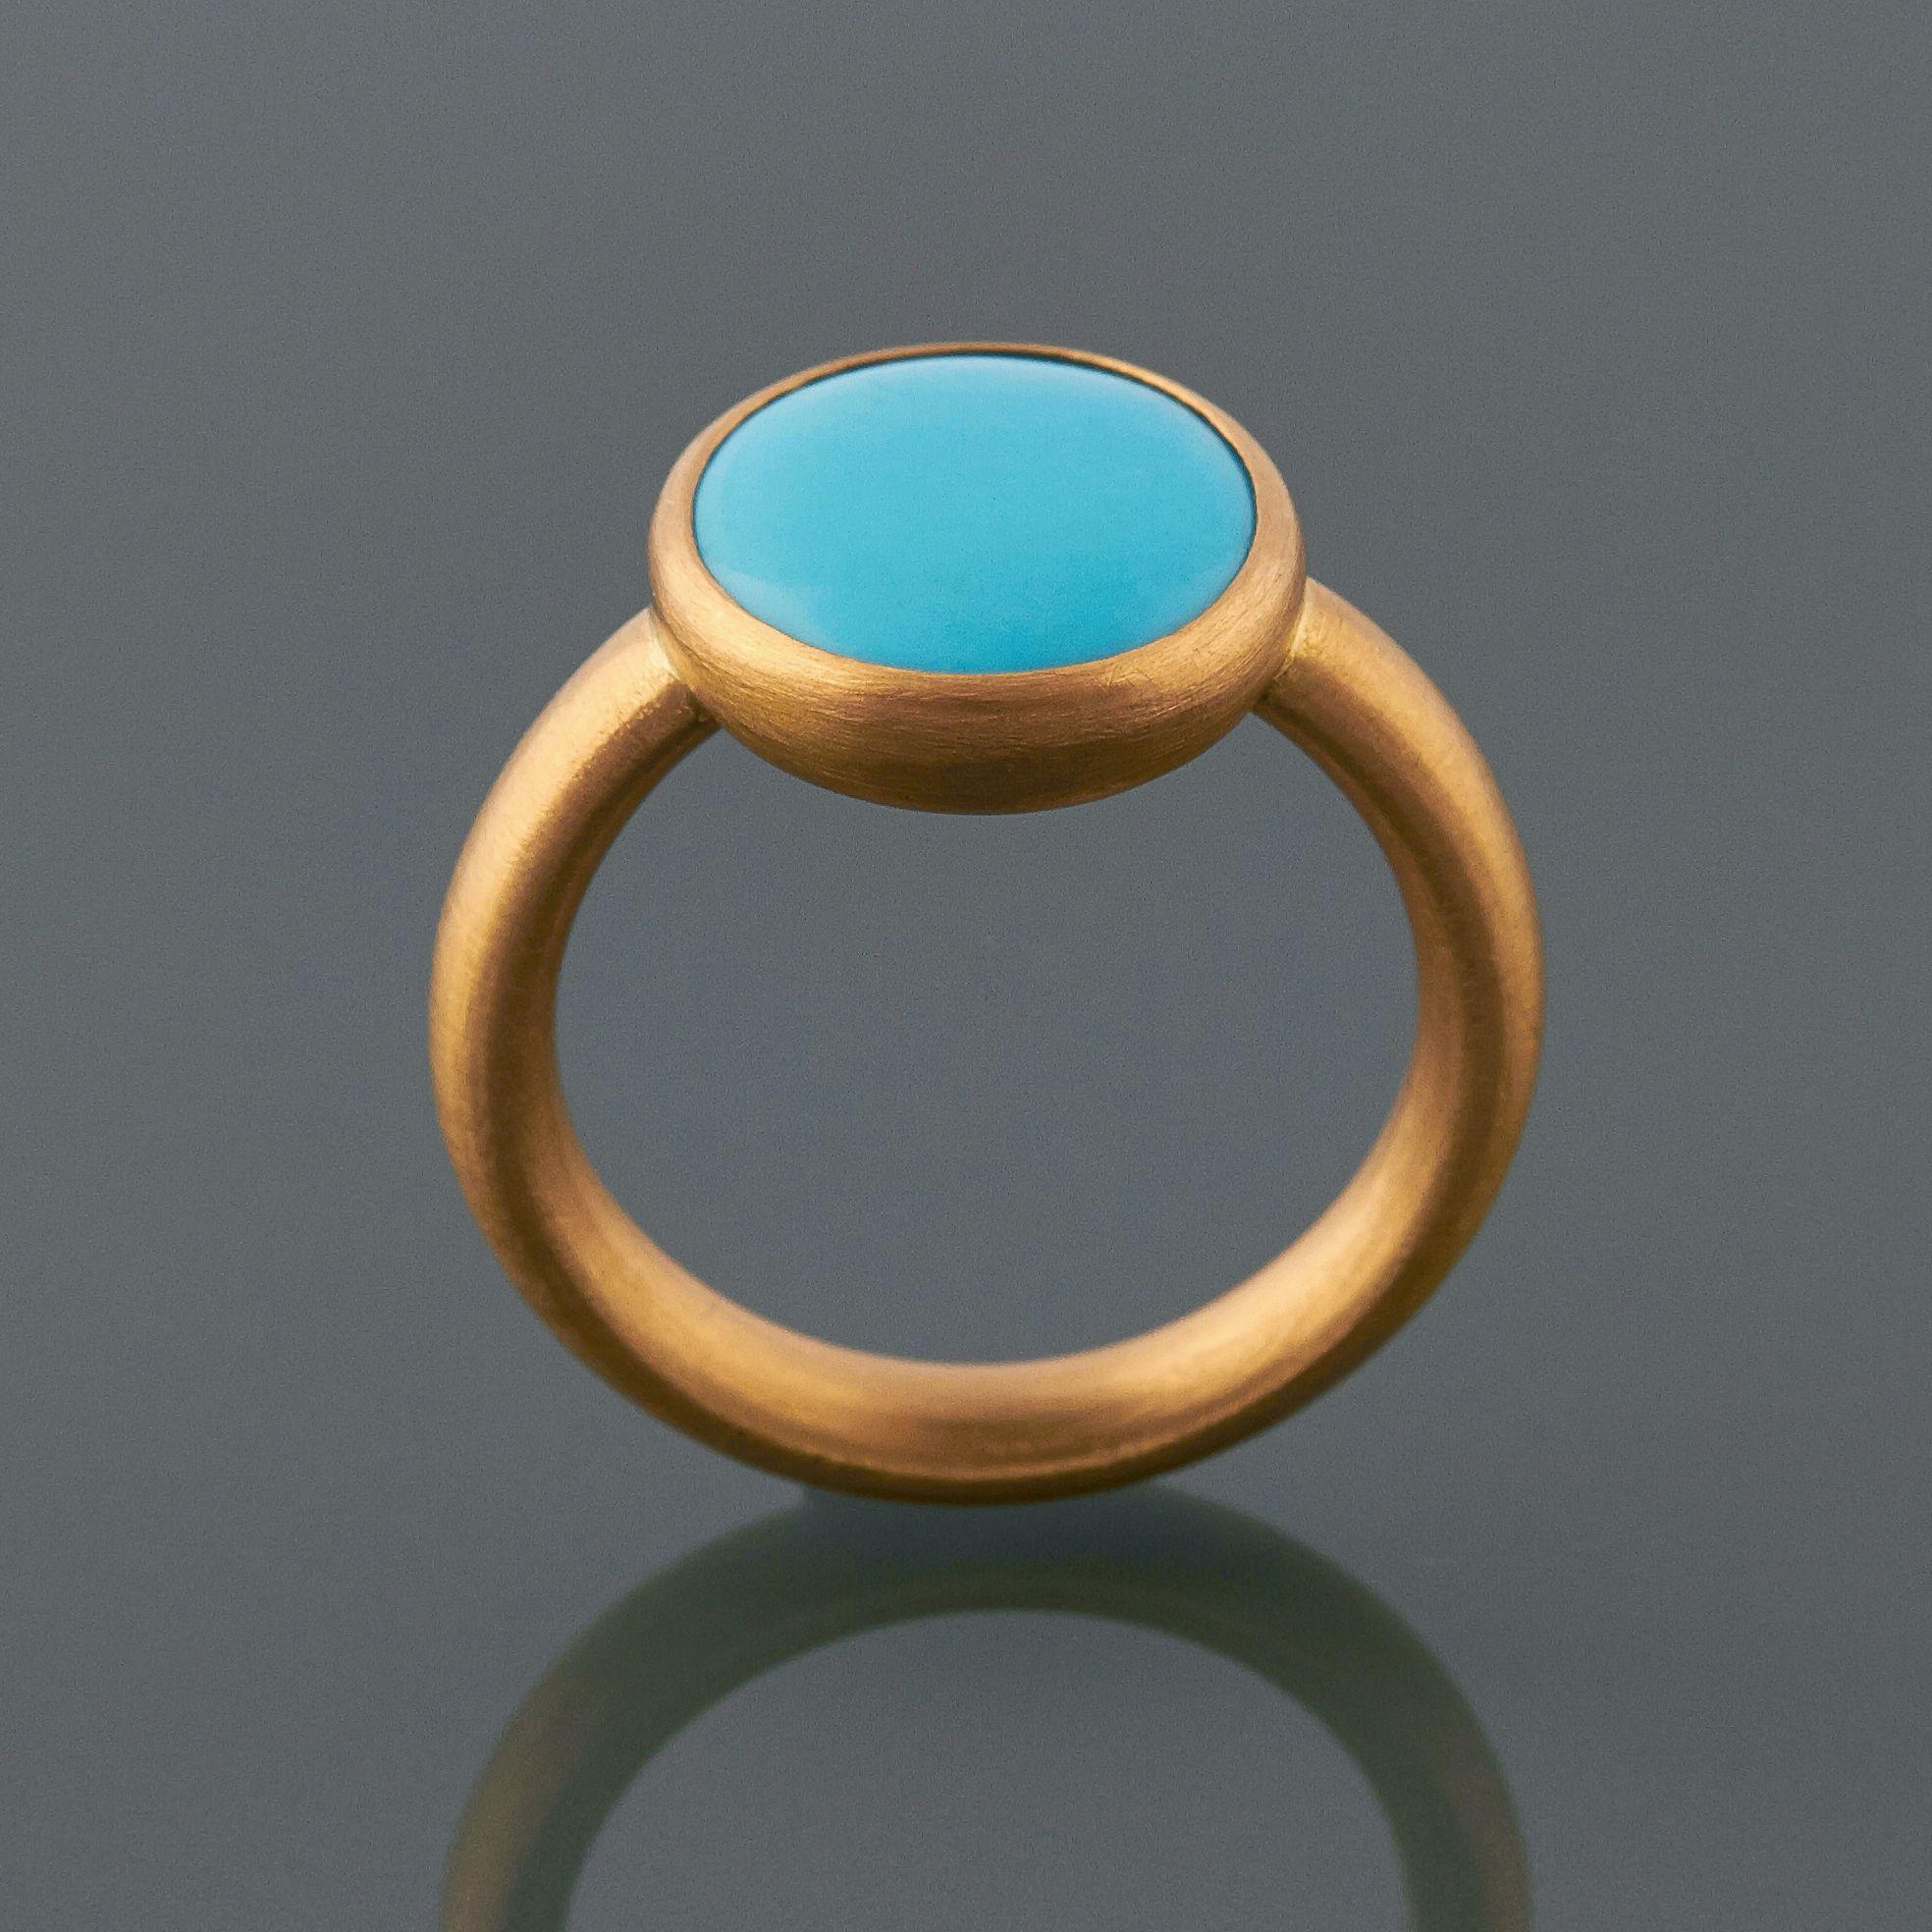 Turquoise Ring In 22ct Gold by Deborah Cadby httpwww